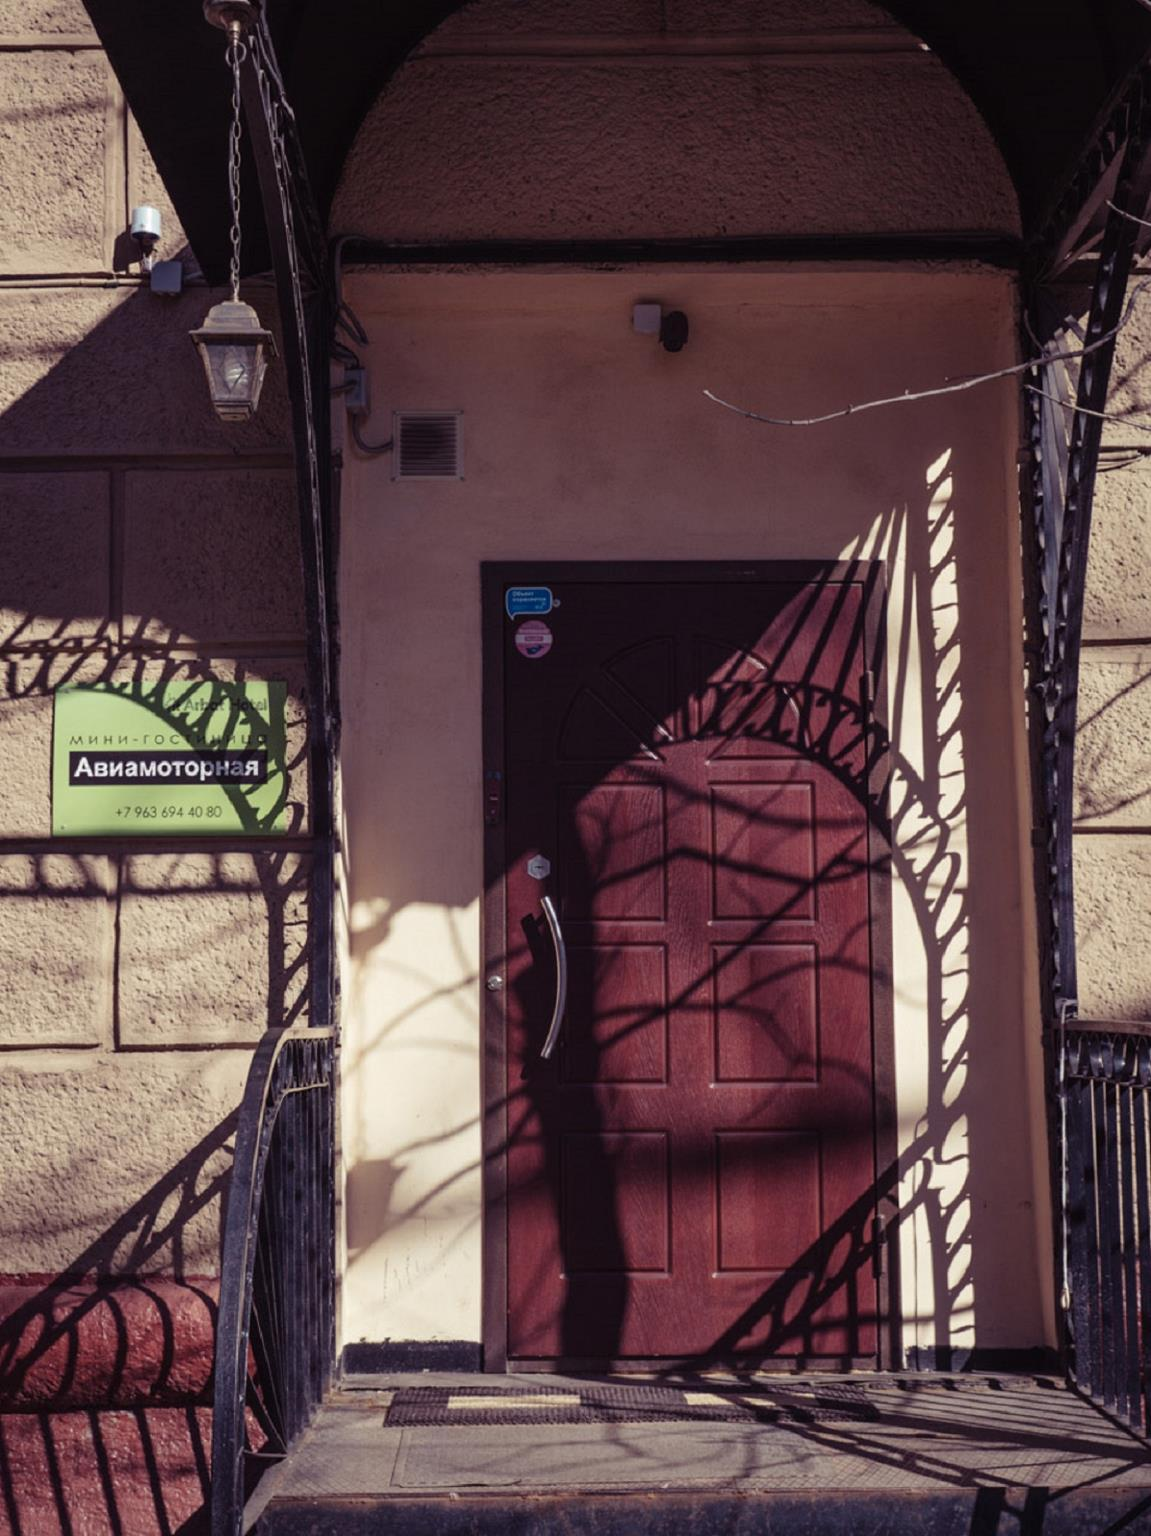 Mini Hotel Aviamotornaya